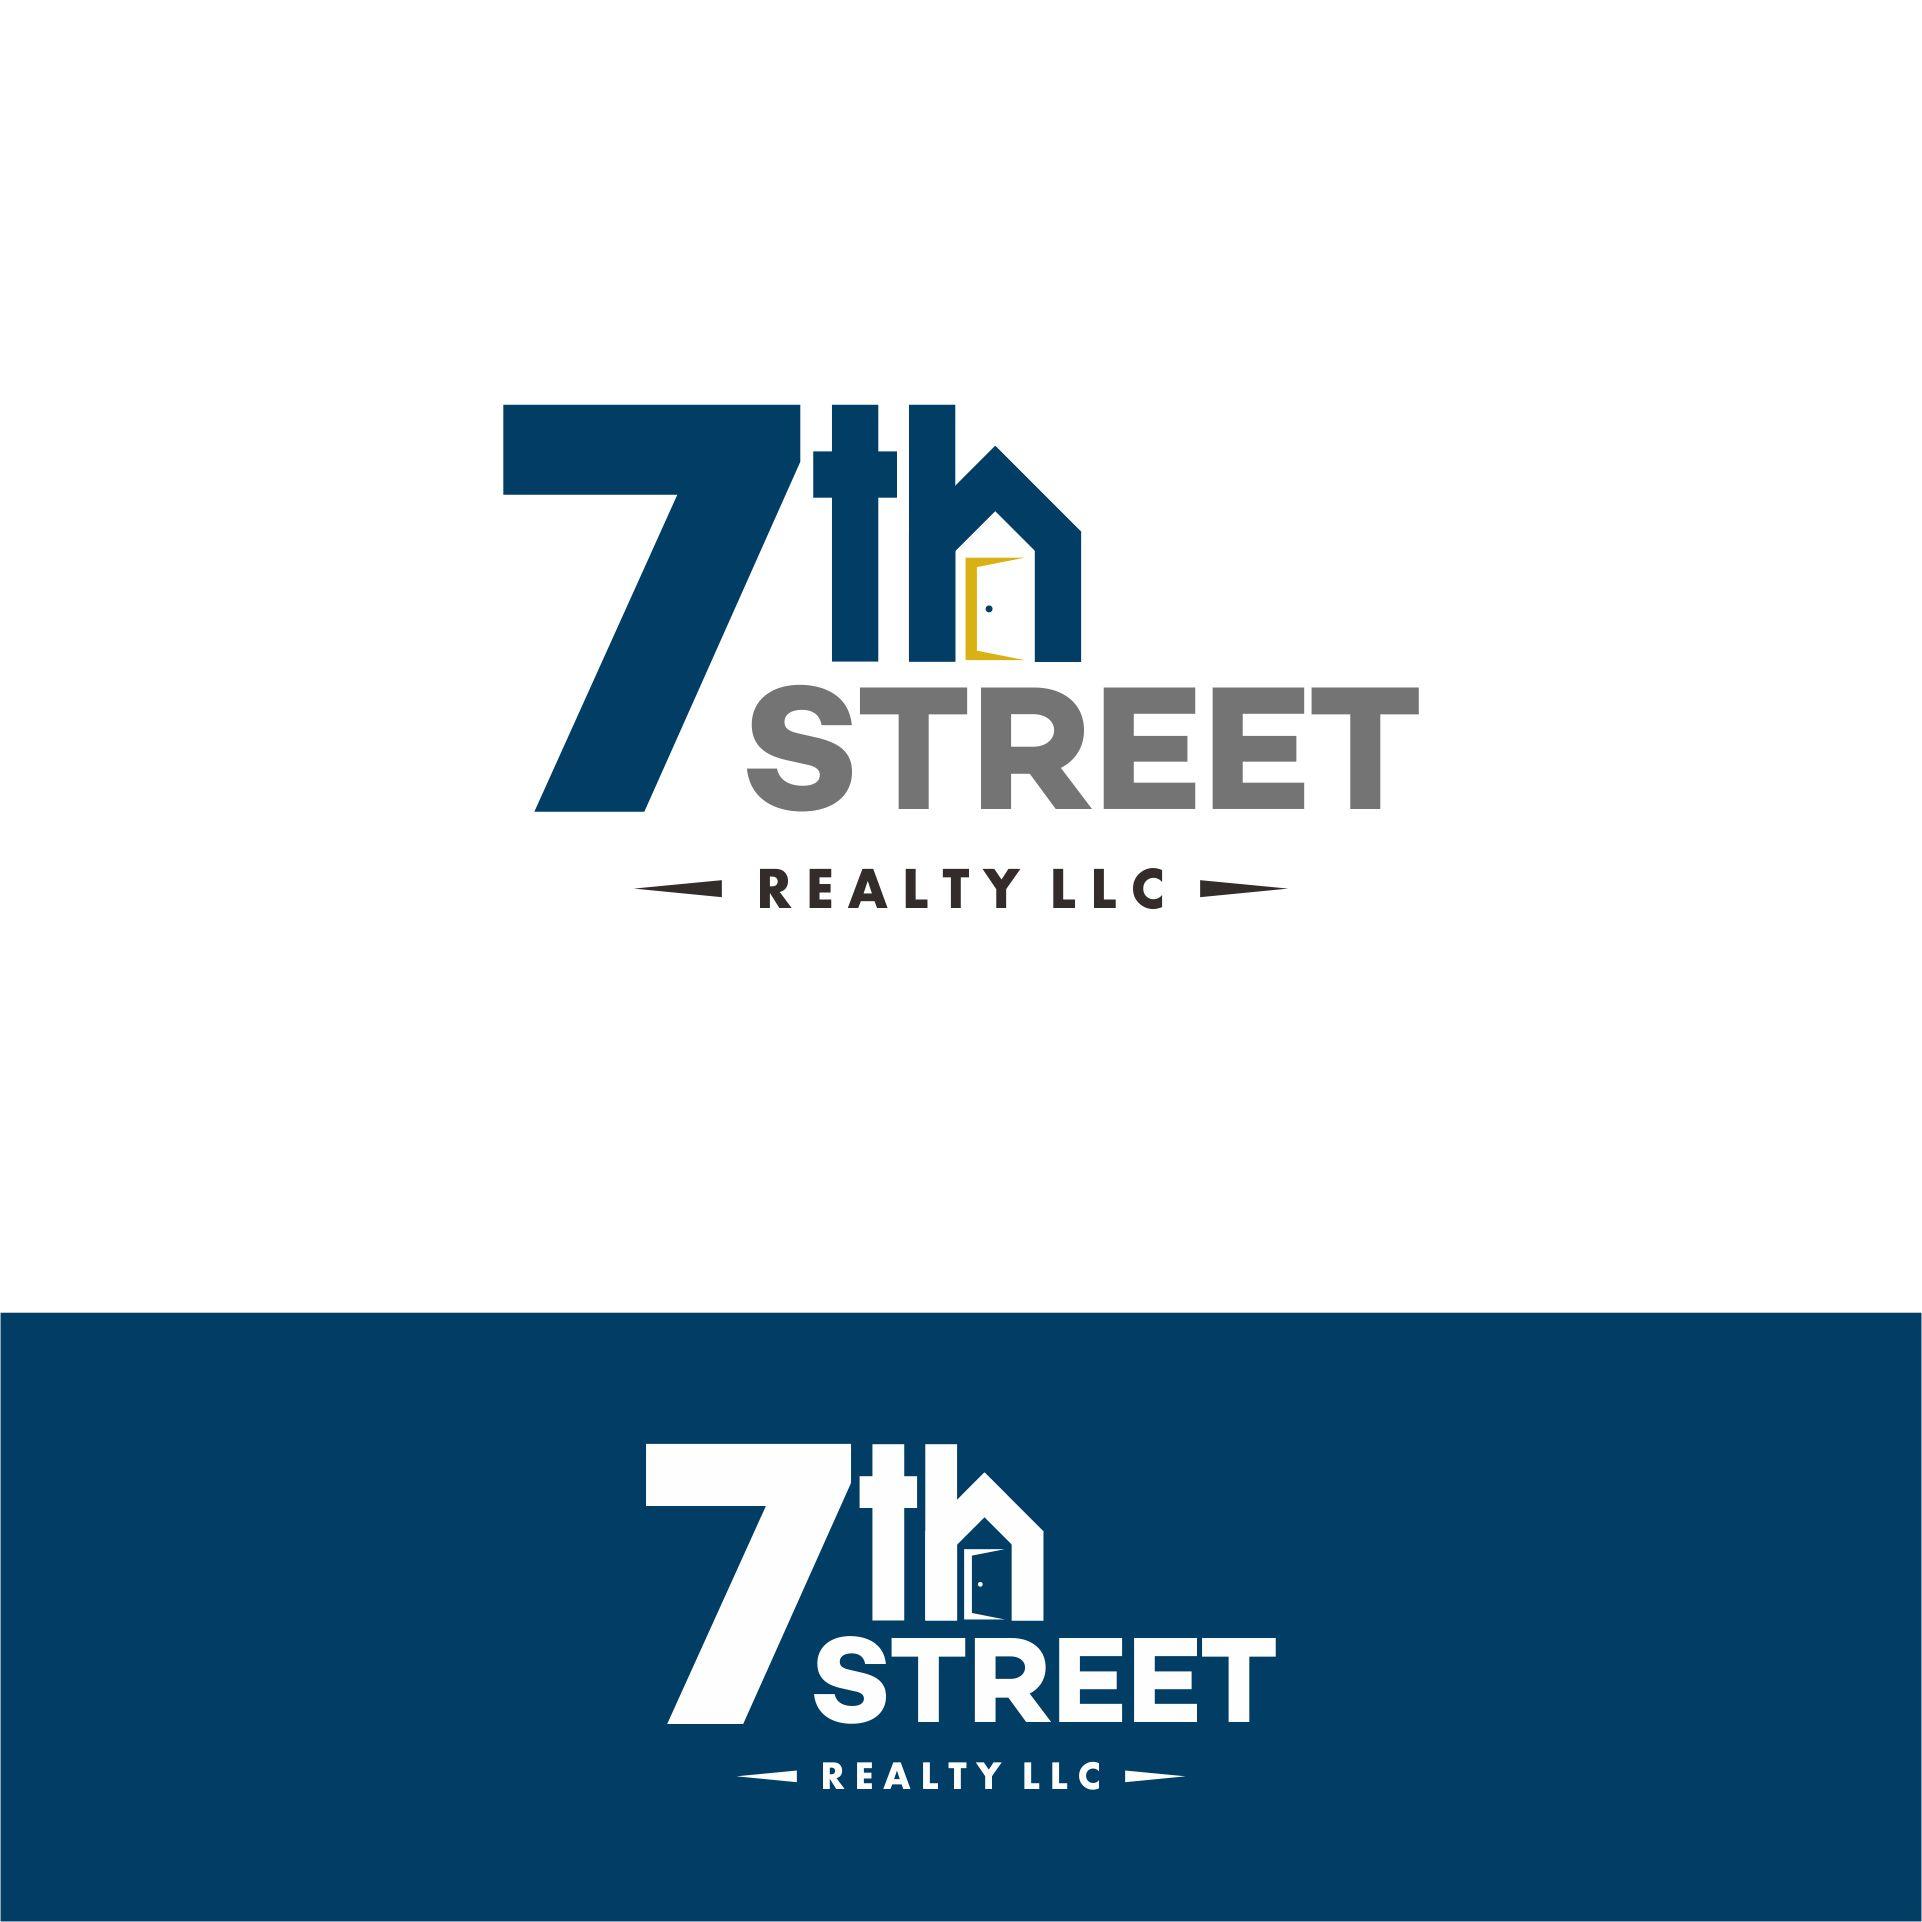 Winning Entry #171 for Logo Design contest - Real Estate & Mortgage Logo Design required - original